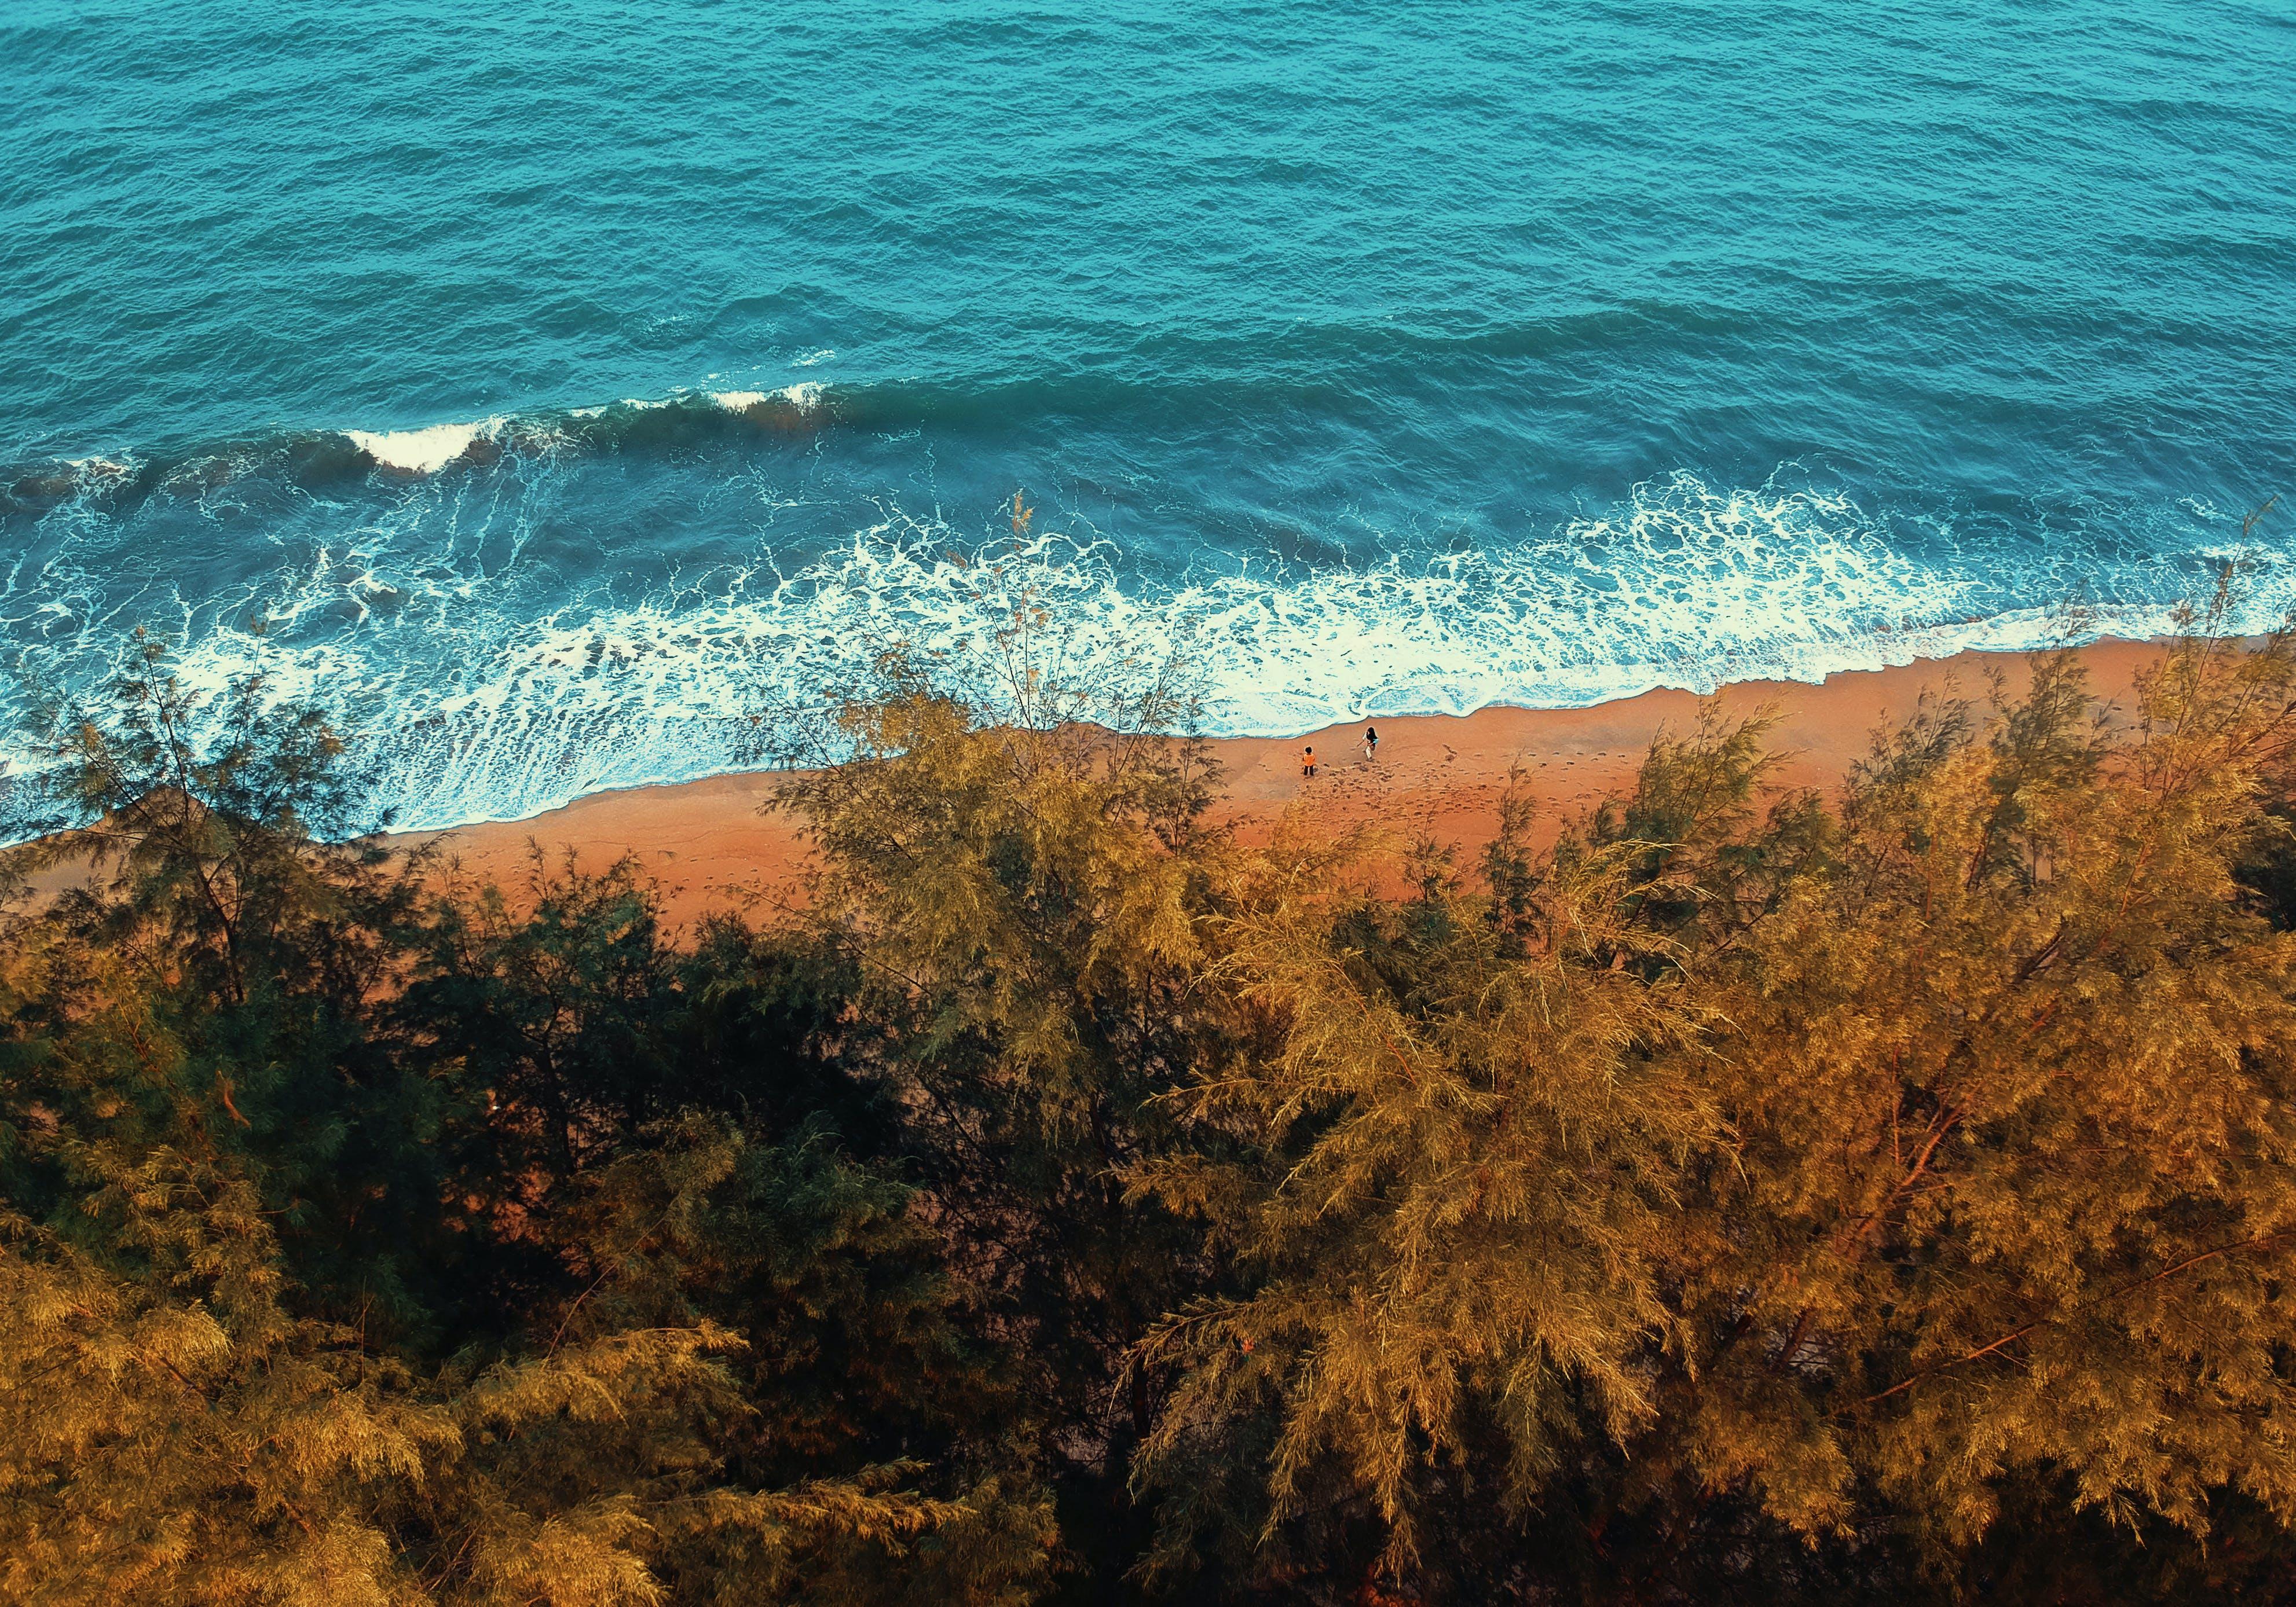 Bird's Eye View of Beach